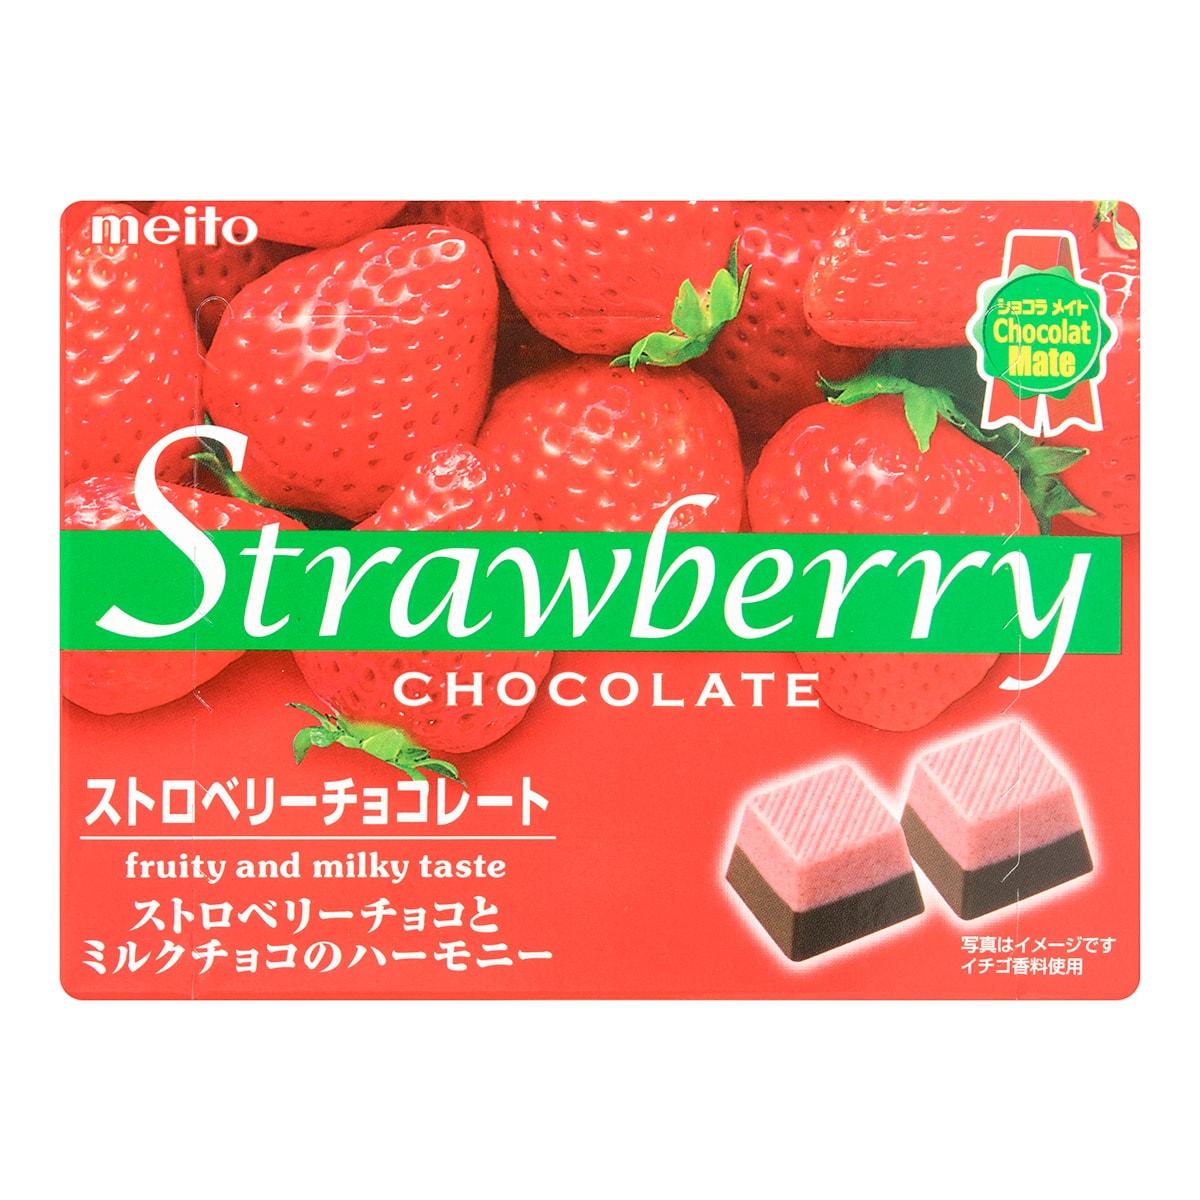 MEITO Strawberry Chocolate 35g